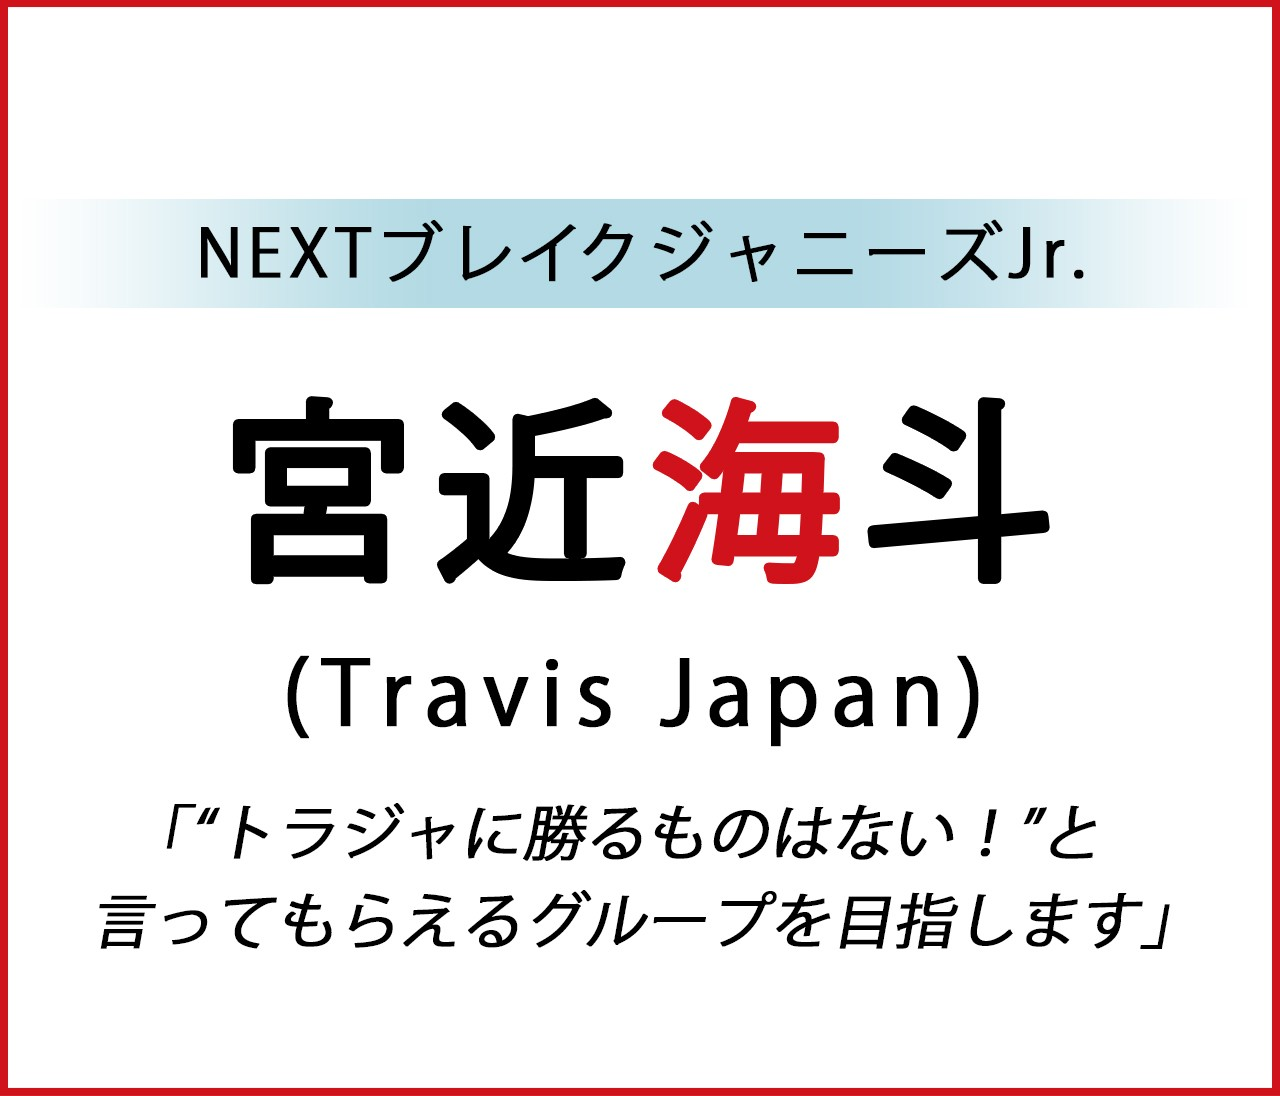 #TravisJapan #宮近海斗 BAILA初登場スペシャルインタビュー!【NextブレイクジャニーズJr.】